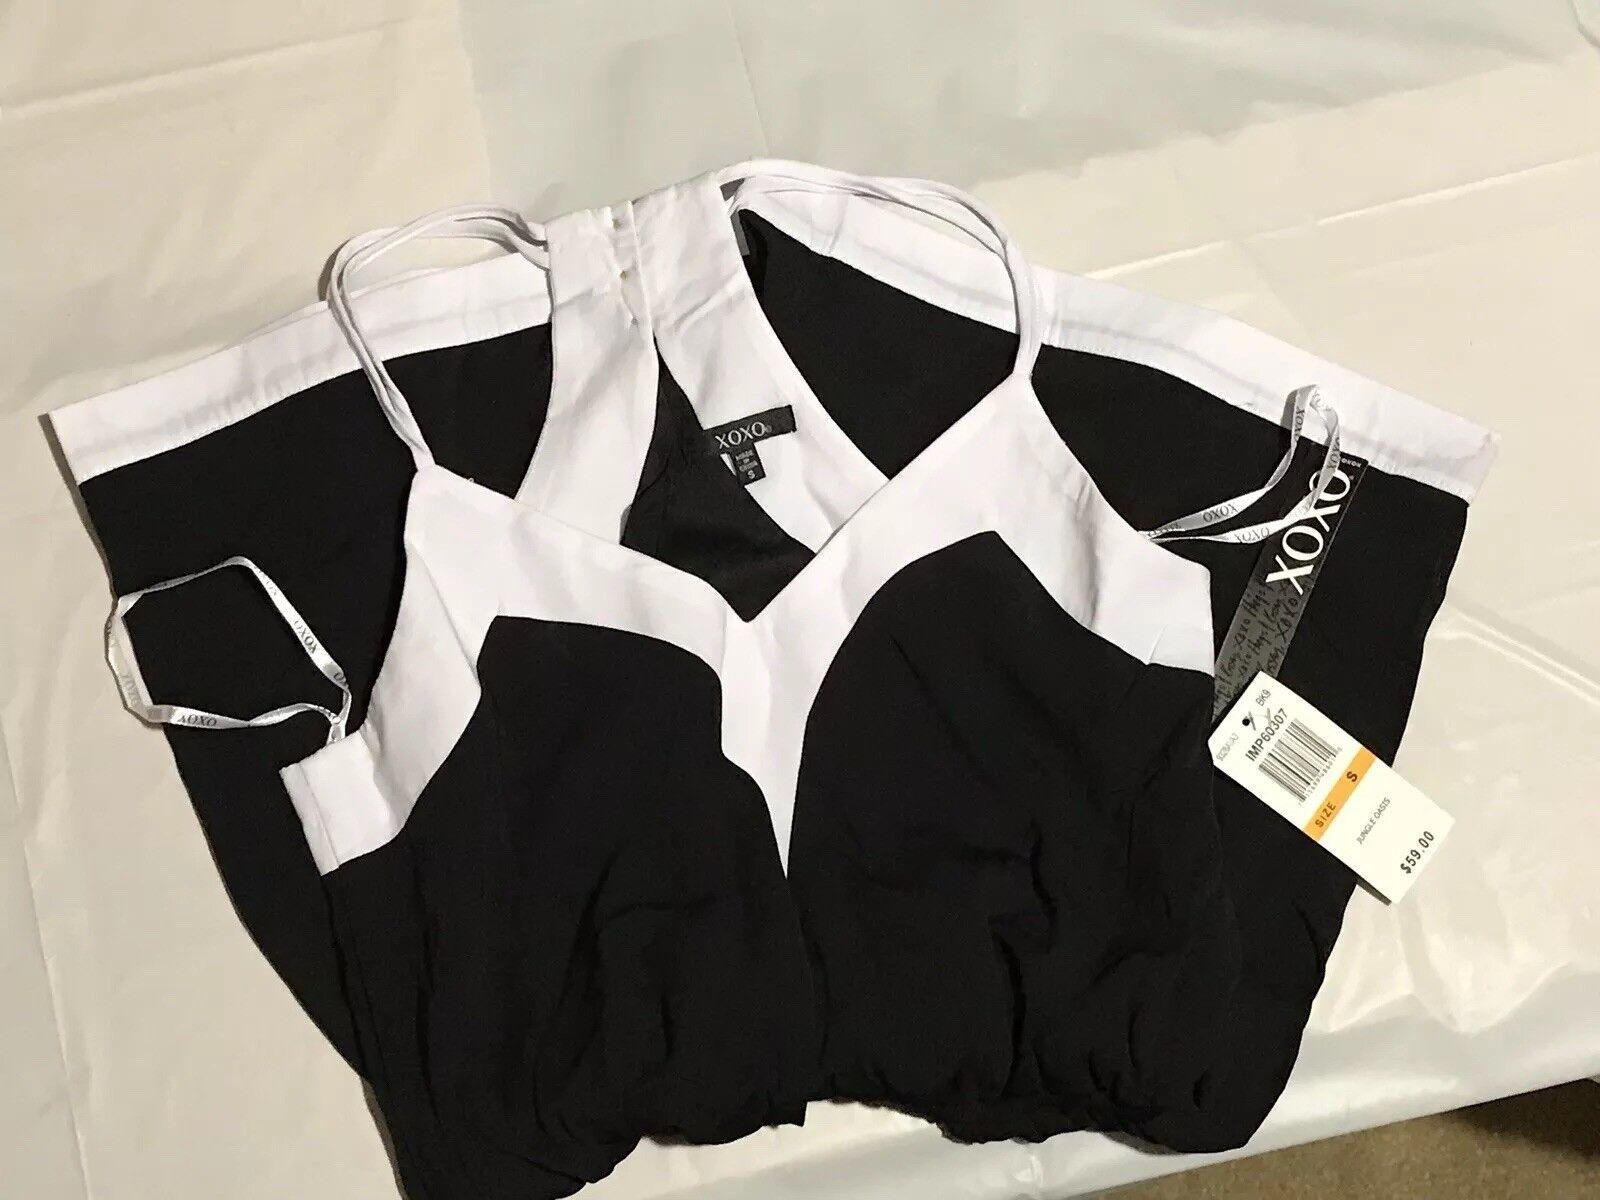 XOXO jumpsuit shorts size Small